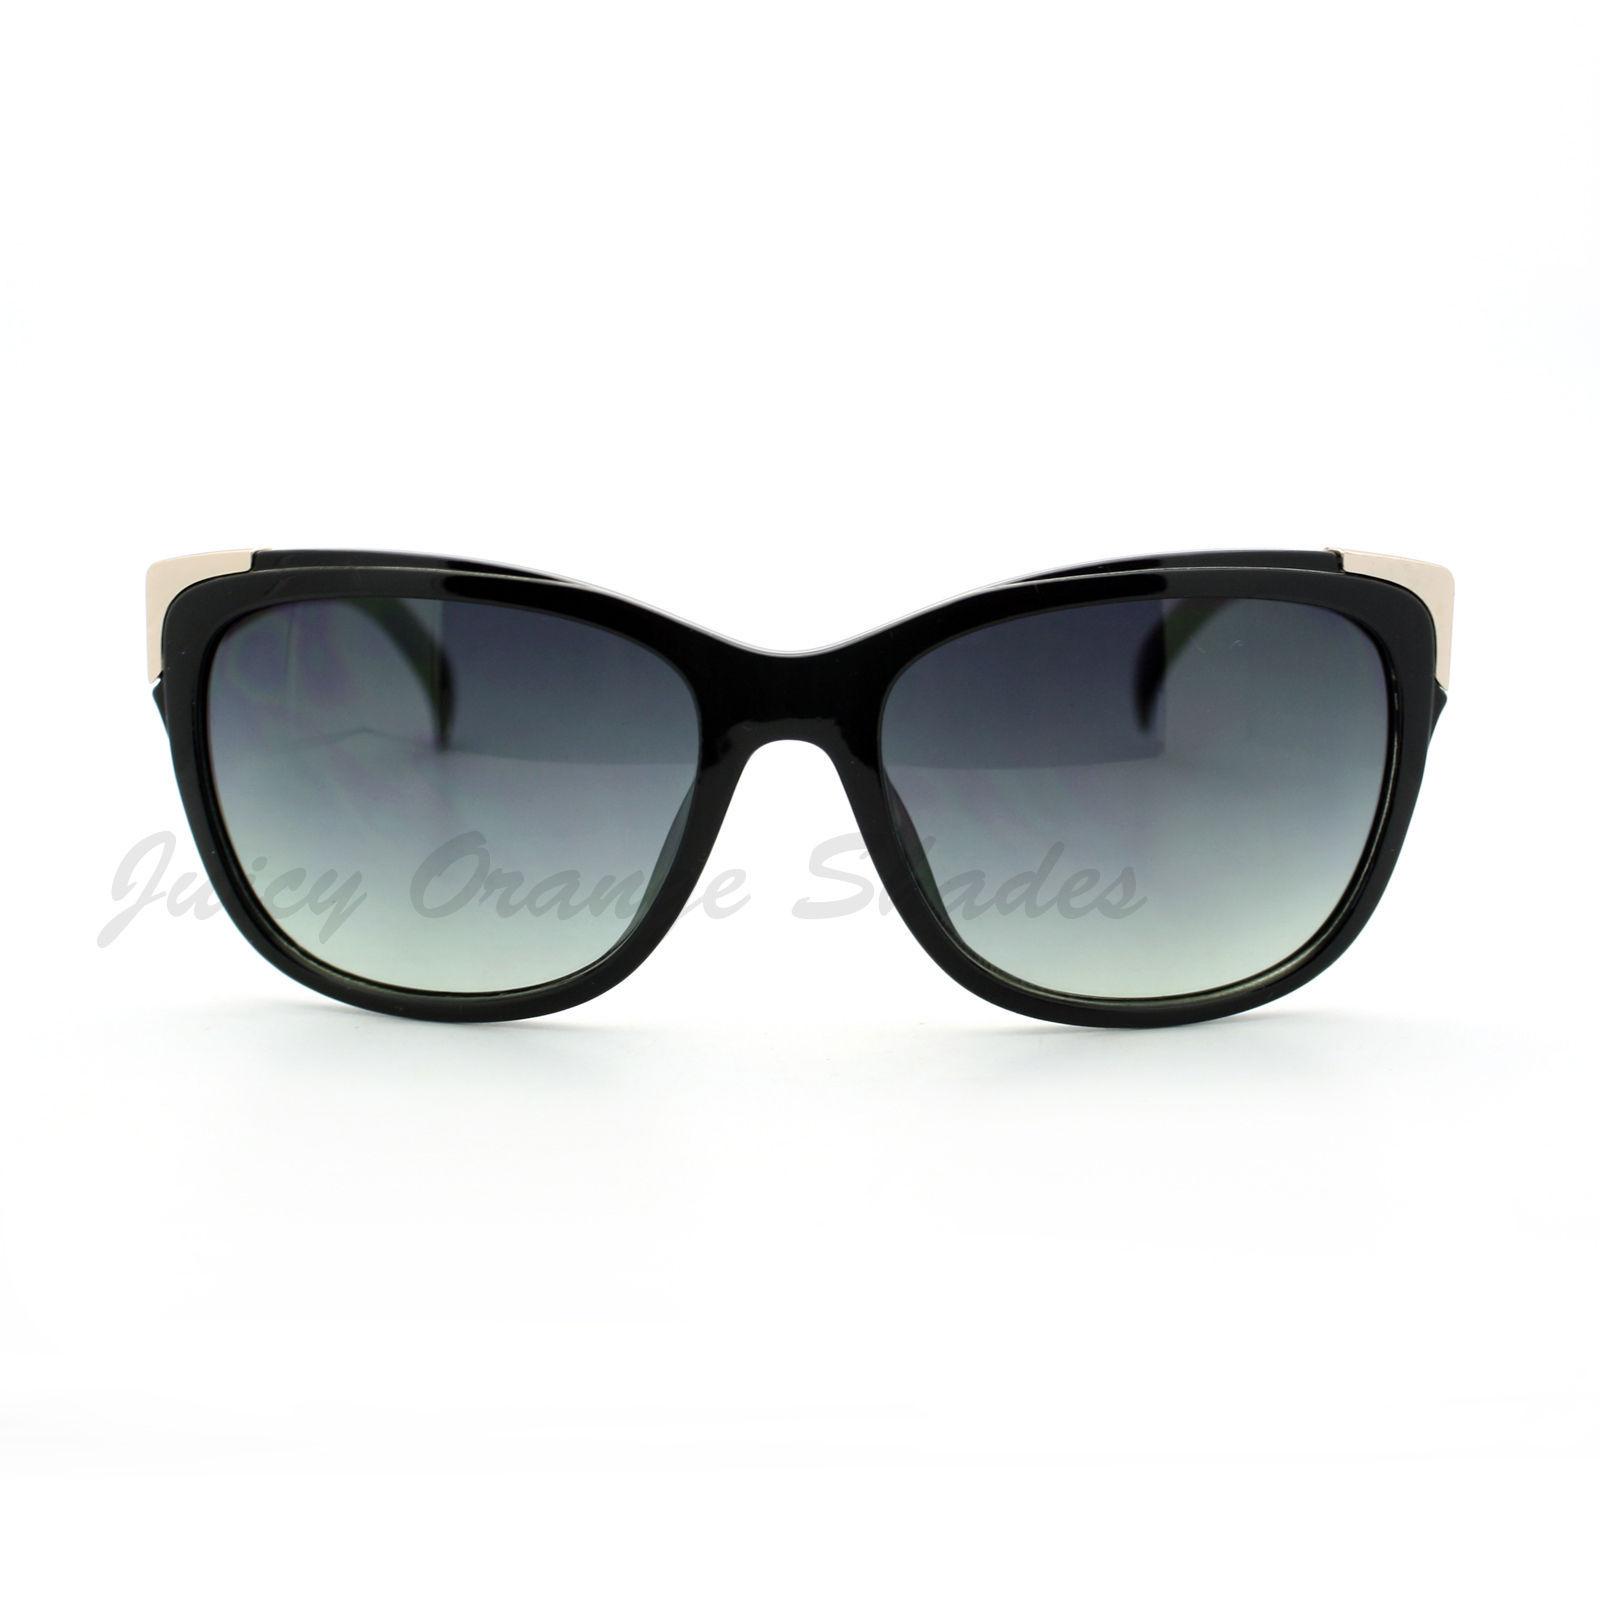 Womens Square Sunglasses Metal Top Corners Chic Trendy Designer Fashion